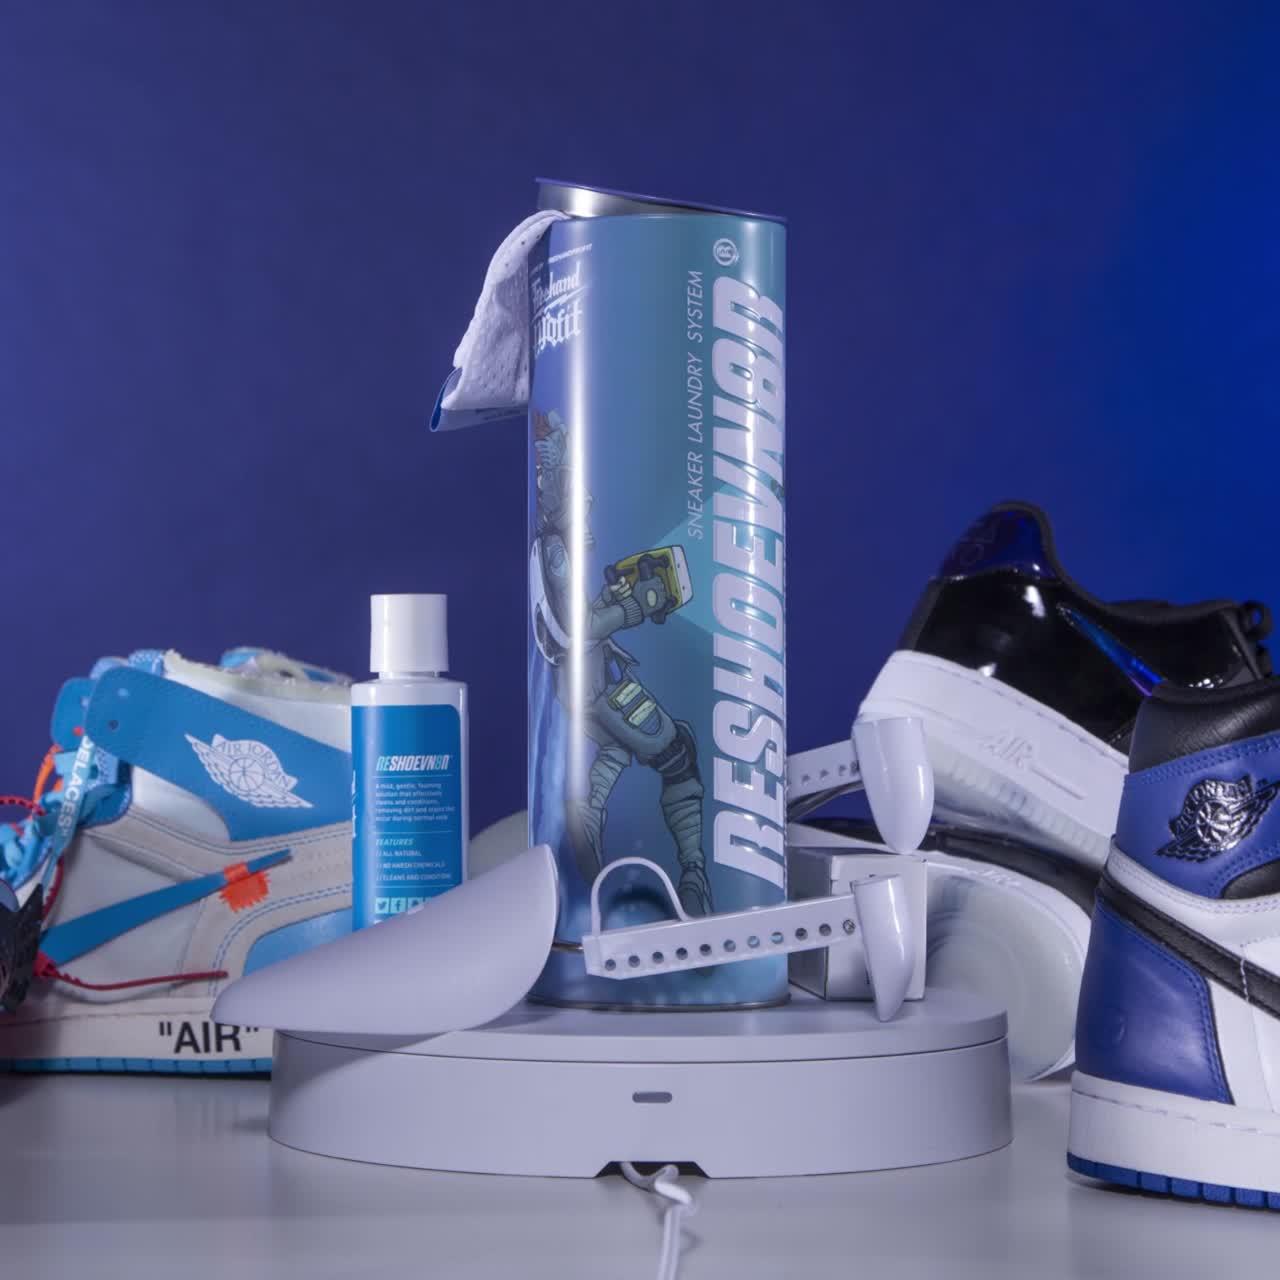 Reshoevn8r x Freehand Profit Sneaker